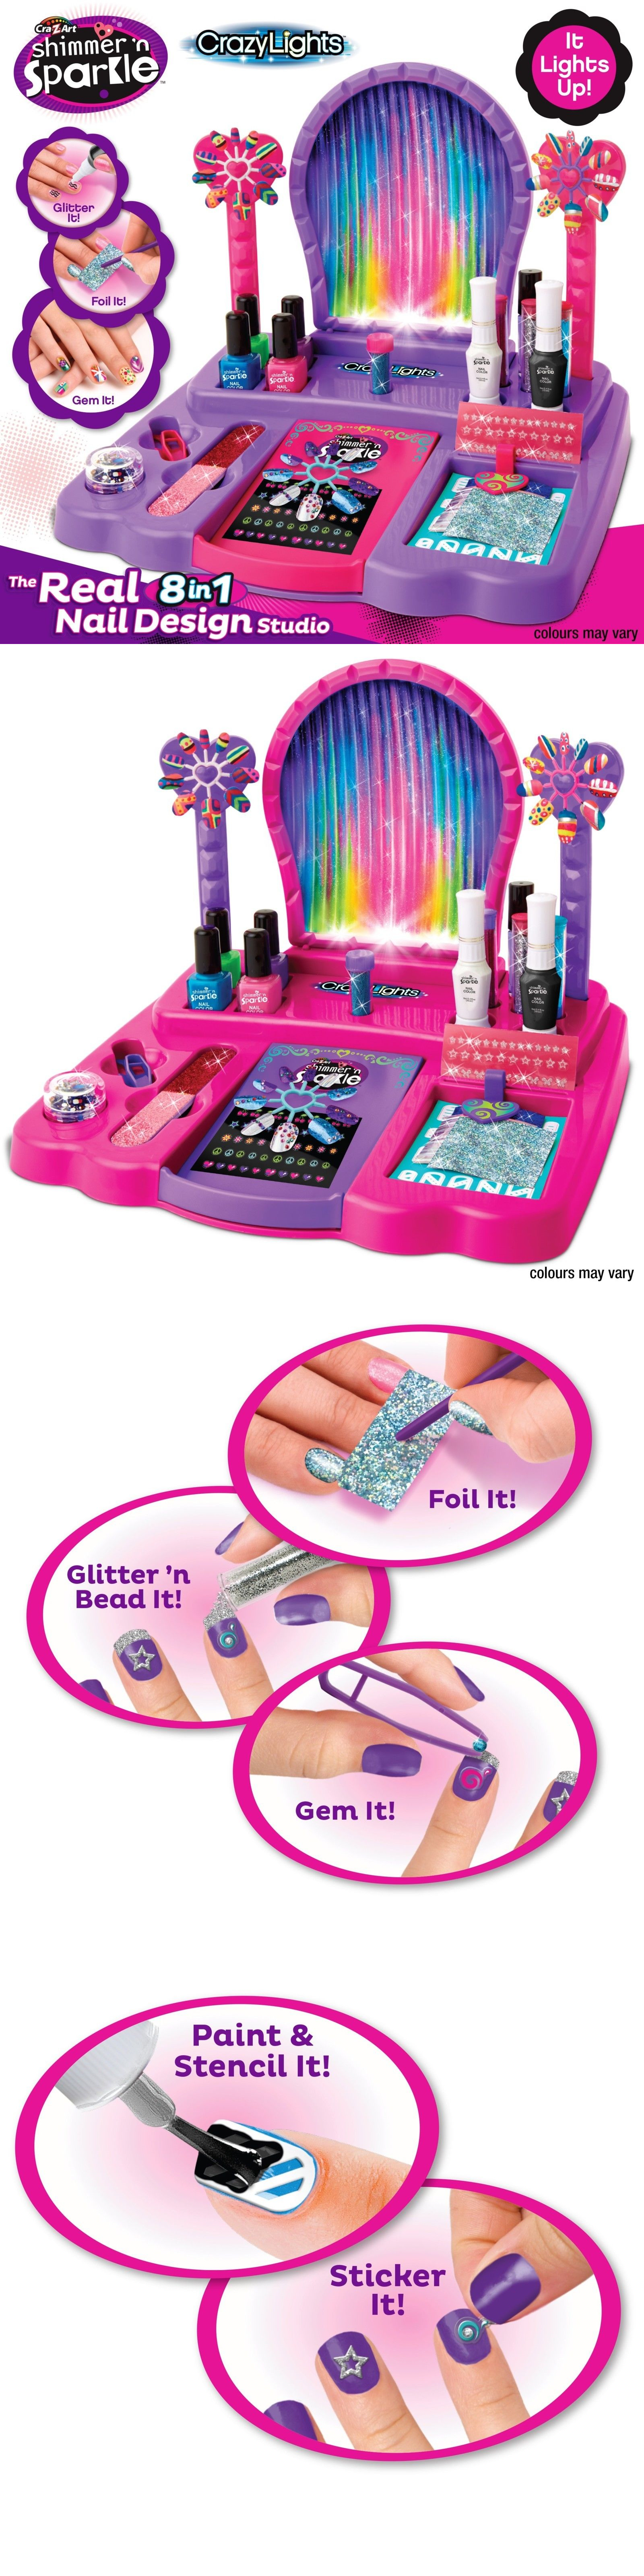 Craft Kits 116655: Nail Salon Kit Kids Girls Cosmetics Nail Arts ...